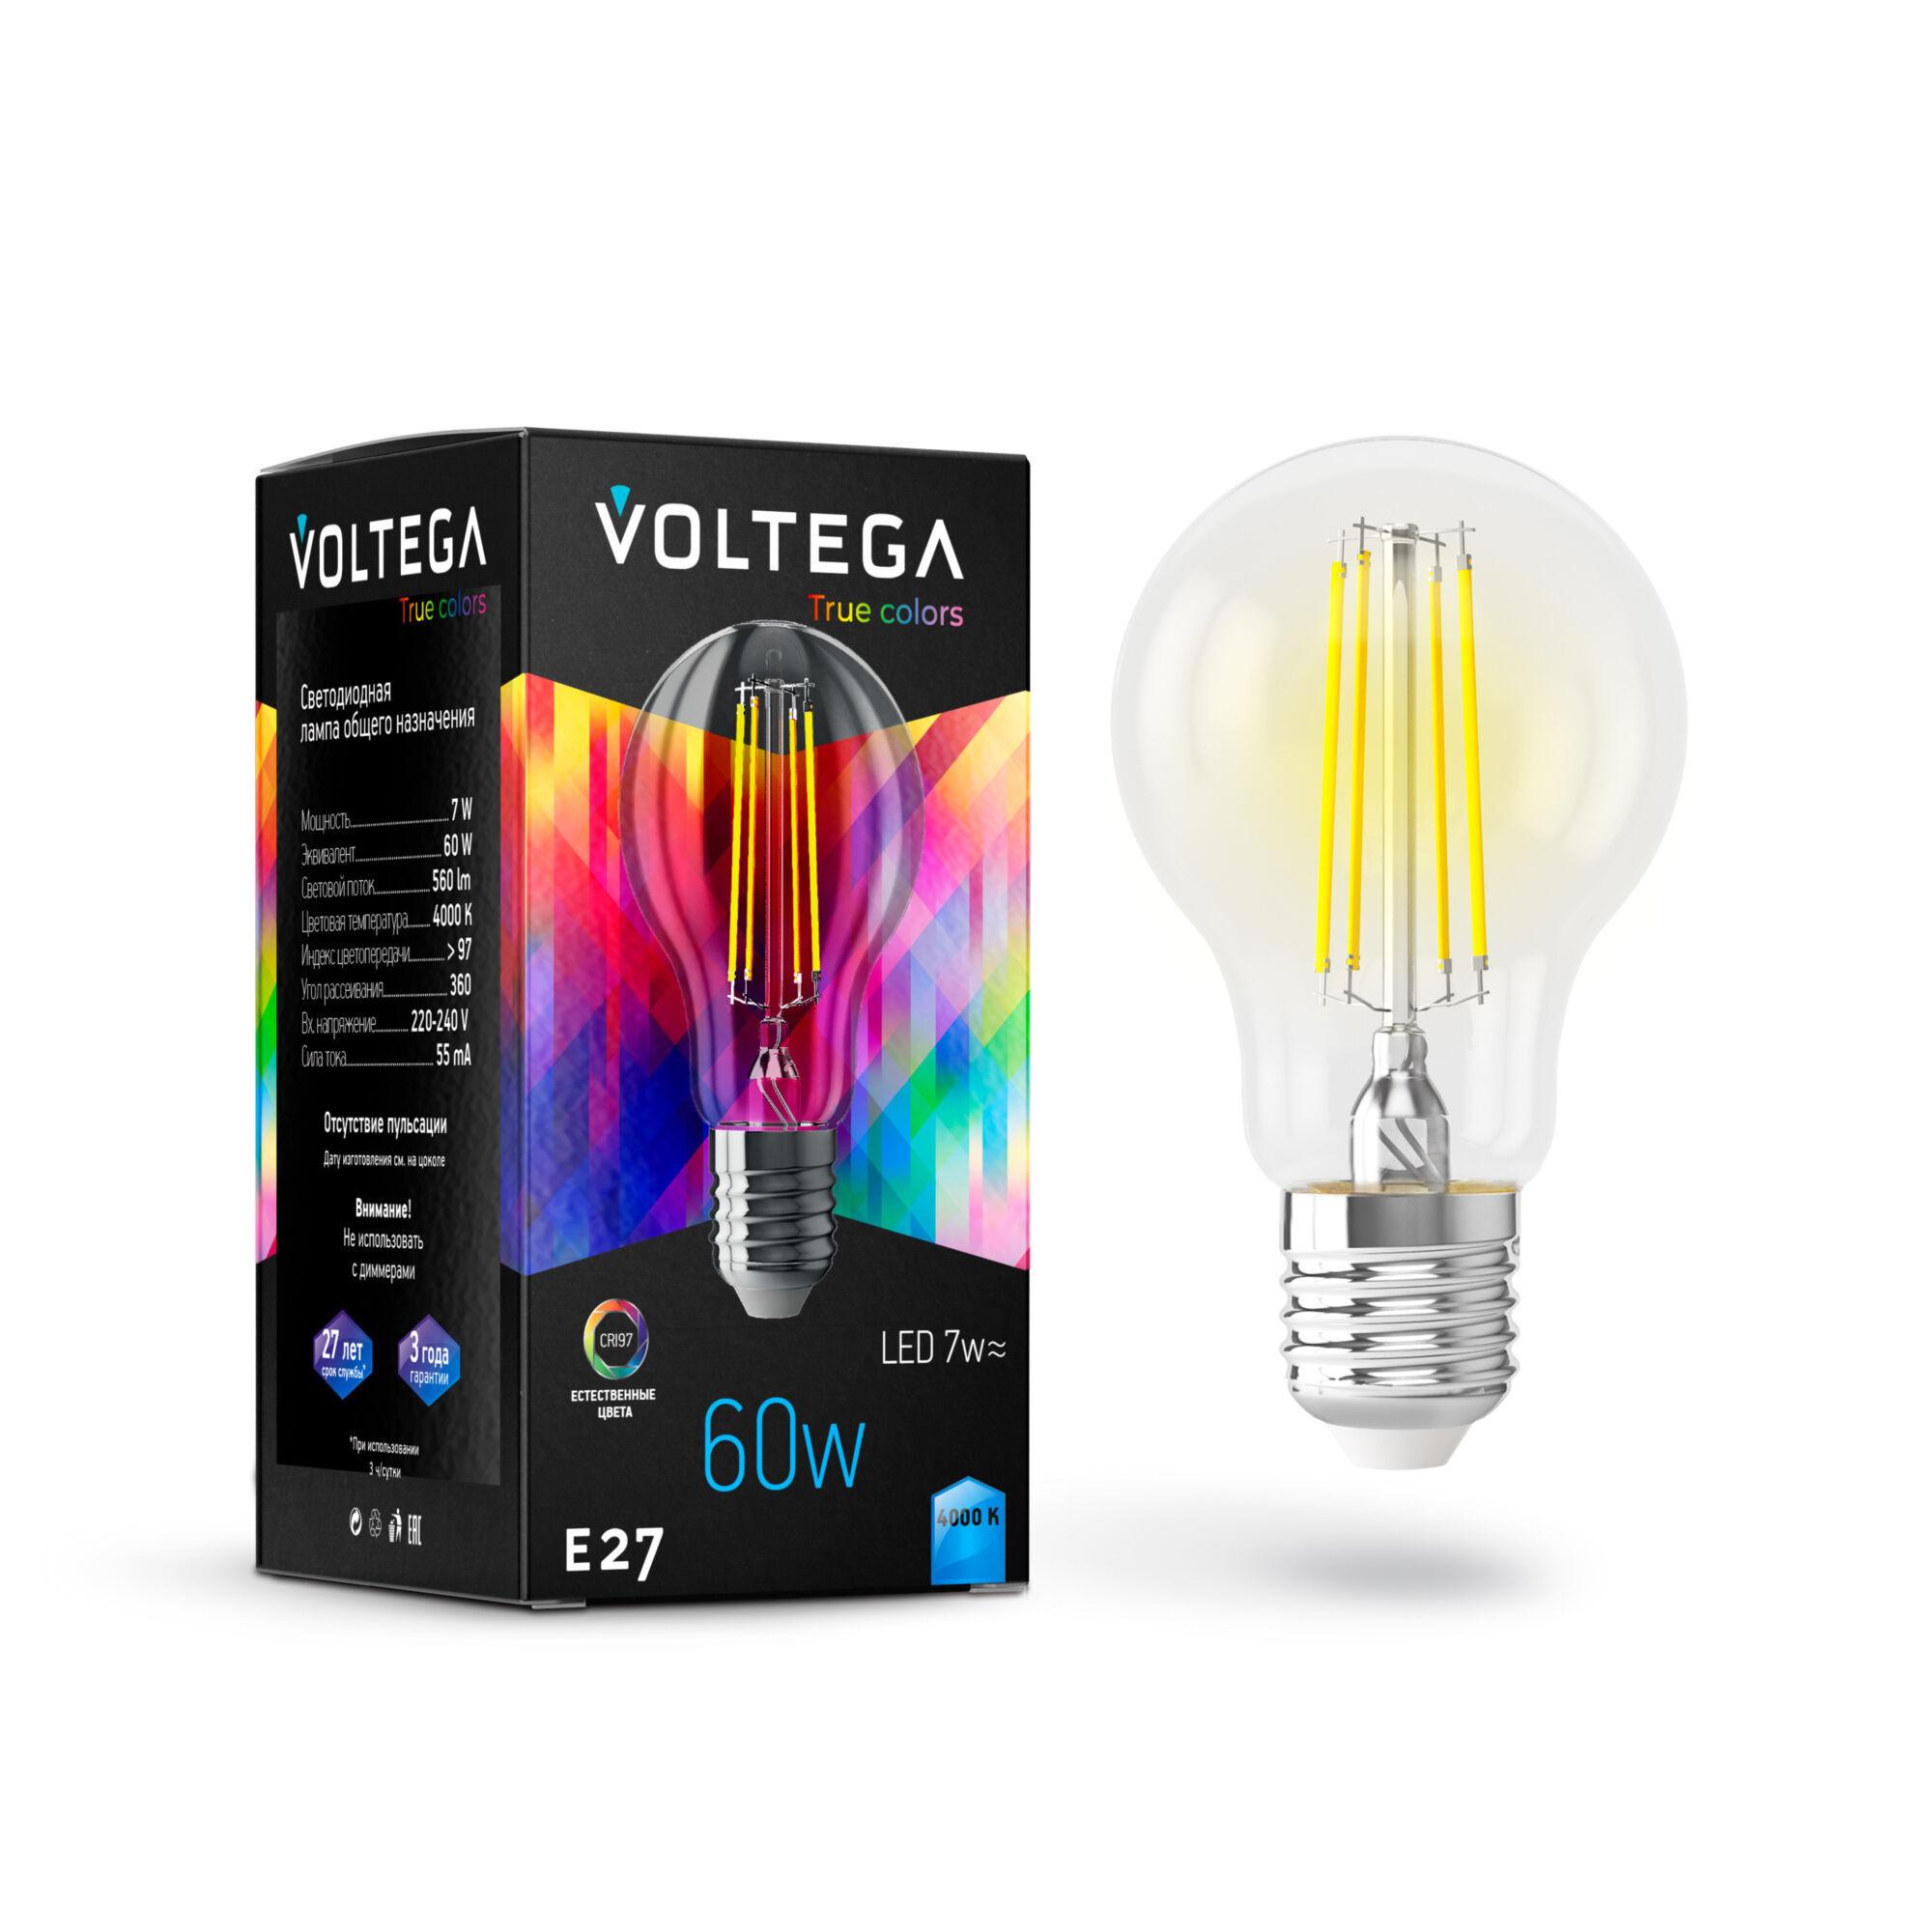 Филаментная светодиодная лампа Voltega VG10-A60E27cold7W-FHR 7155 груша E27 7W, 4000K 220-240V, гарантия 3 года - фото 1